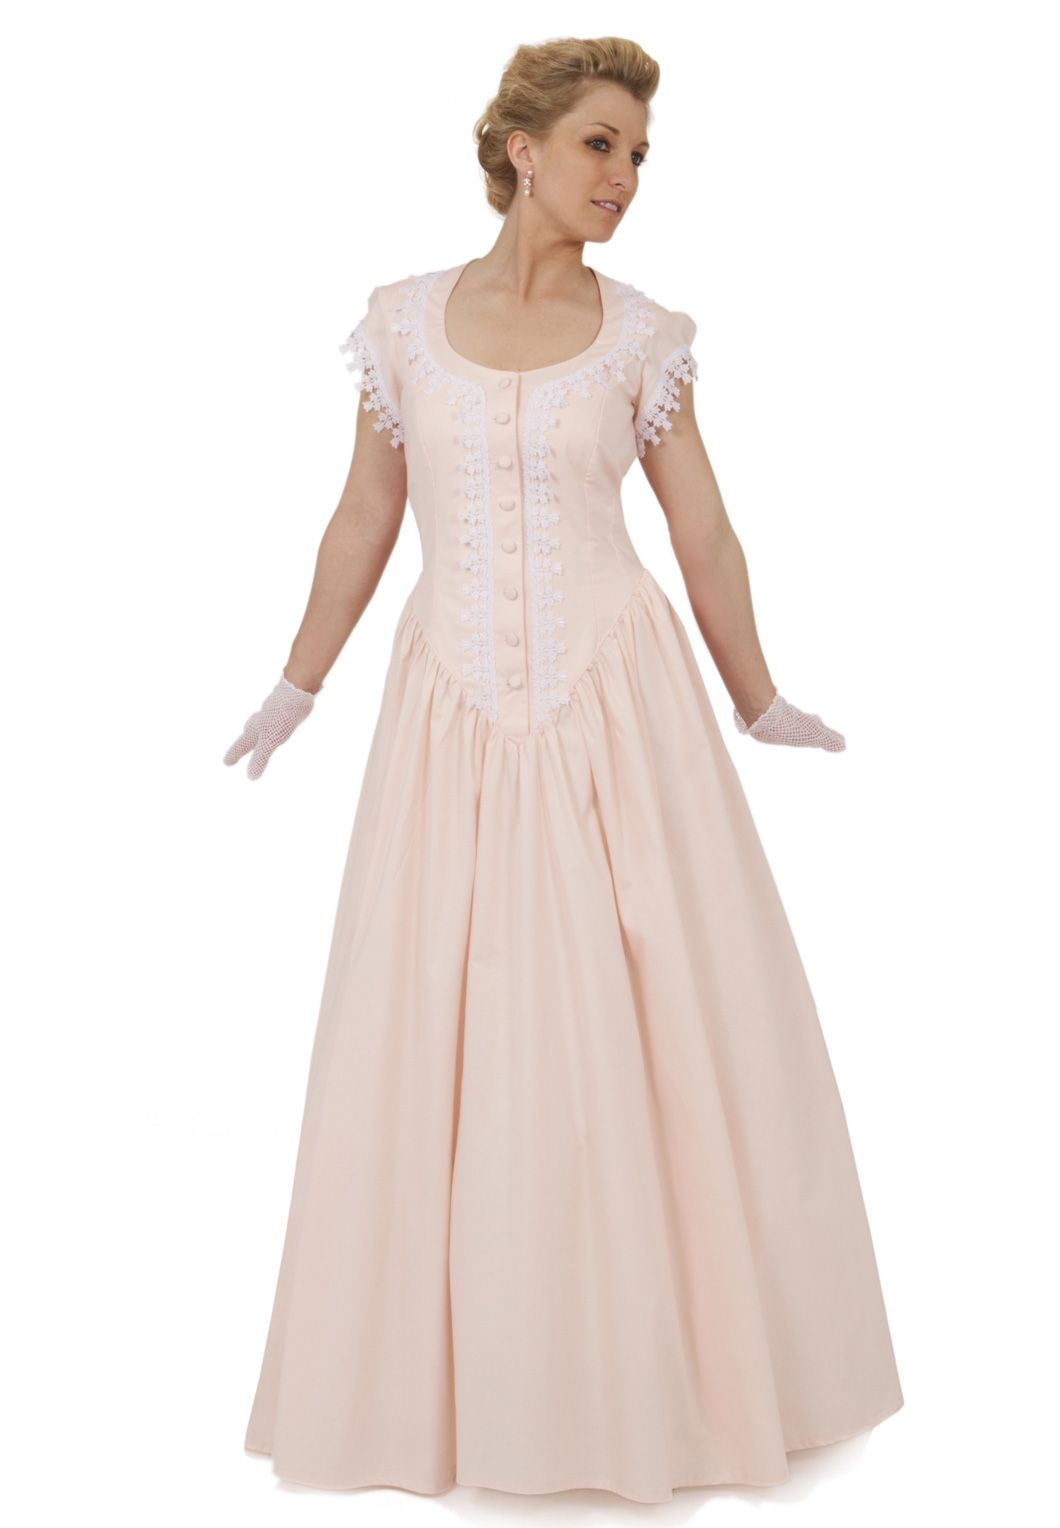 Madeleine Victorian Summer Dress Cotton Dress Summer Old Fashion Dresses Victorian Fashion Dresses [ 1528 x 1060 Pixel ]